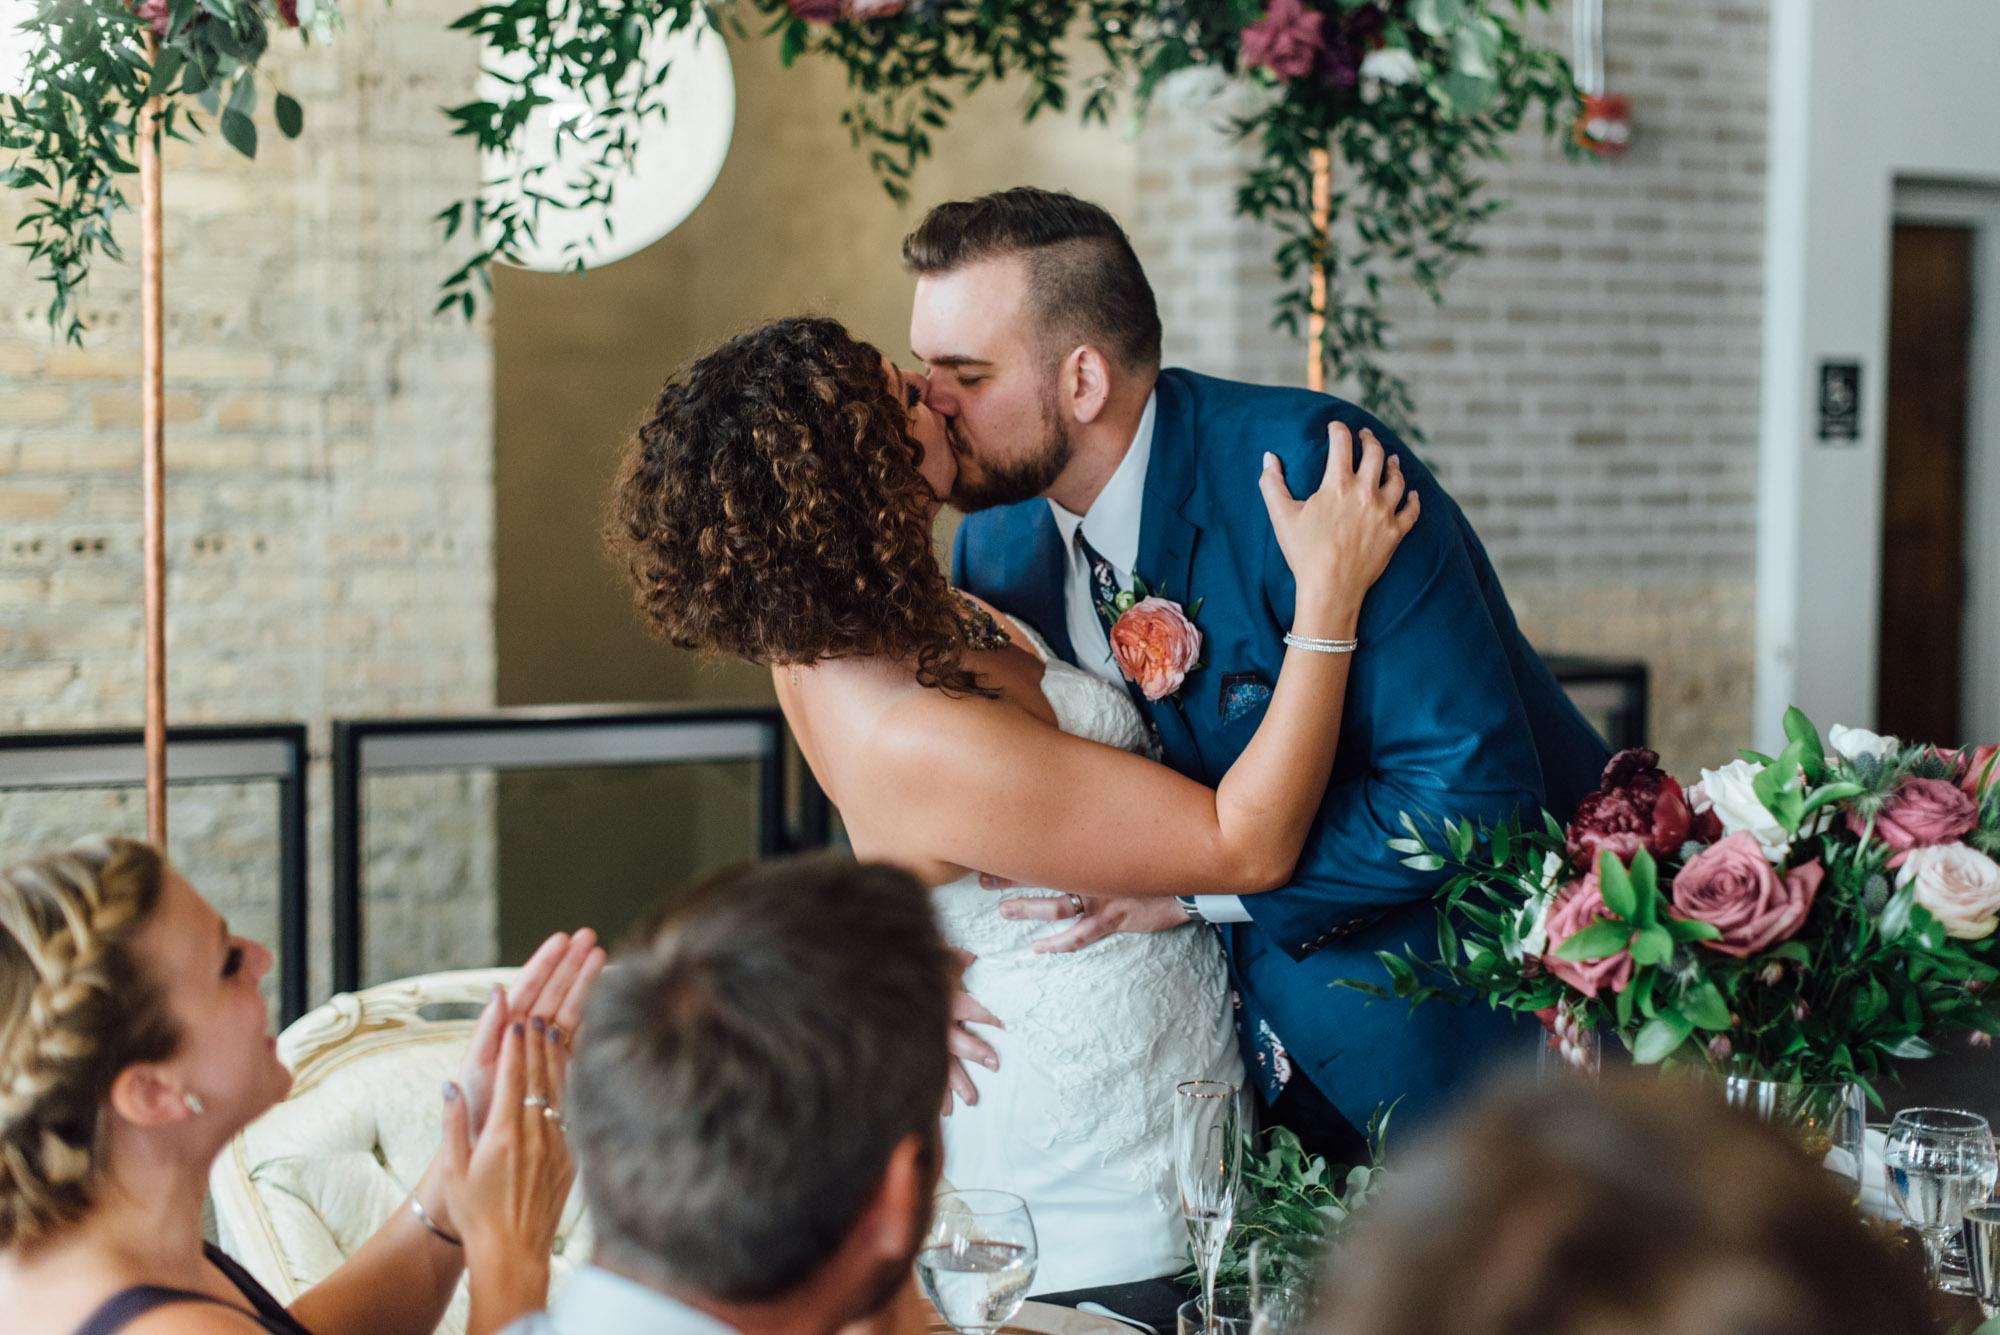 five-event-center-wedding-photographe-1-4.jpg